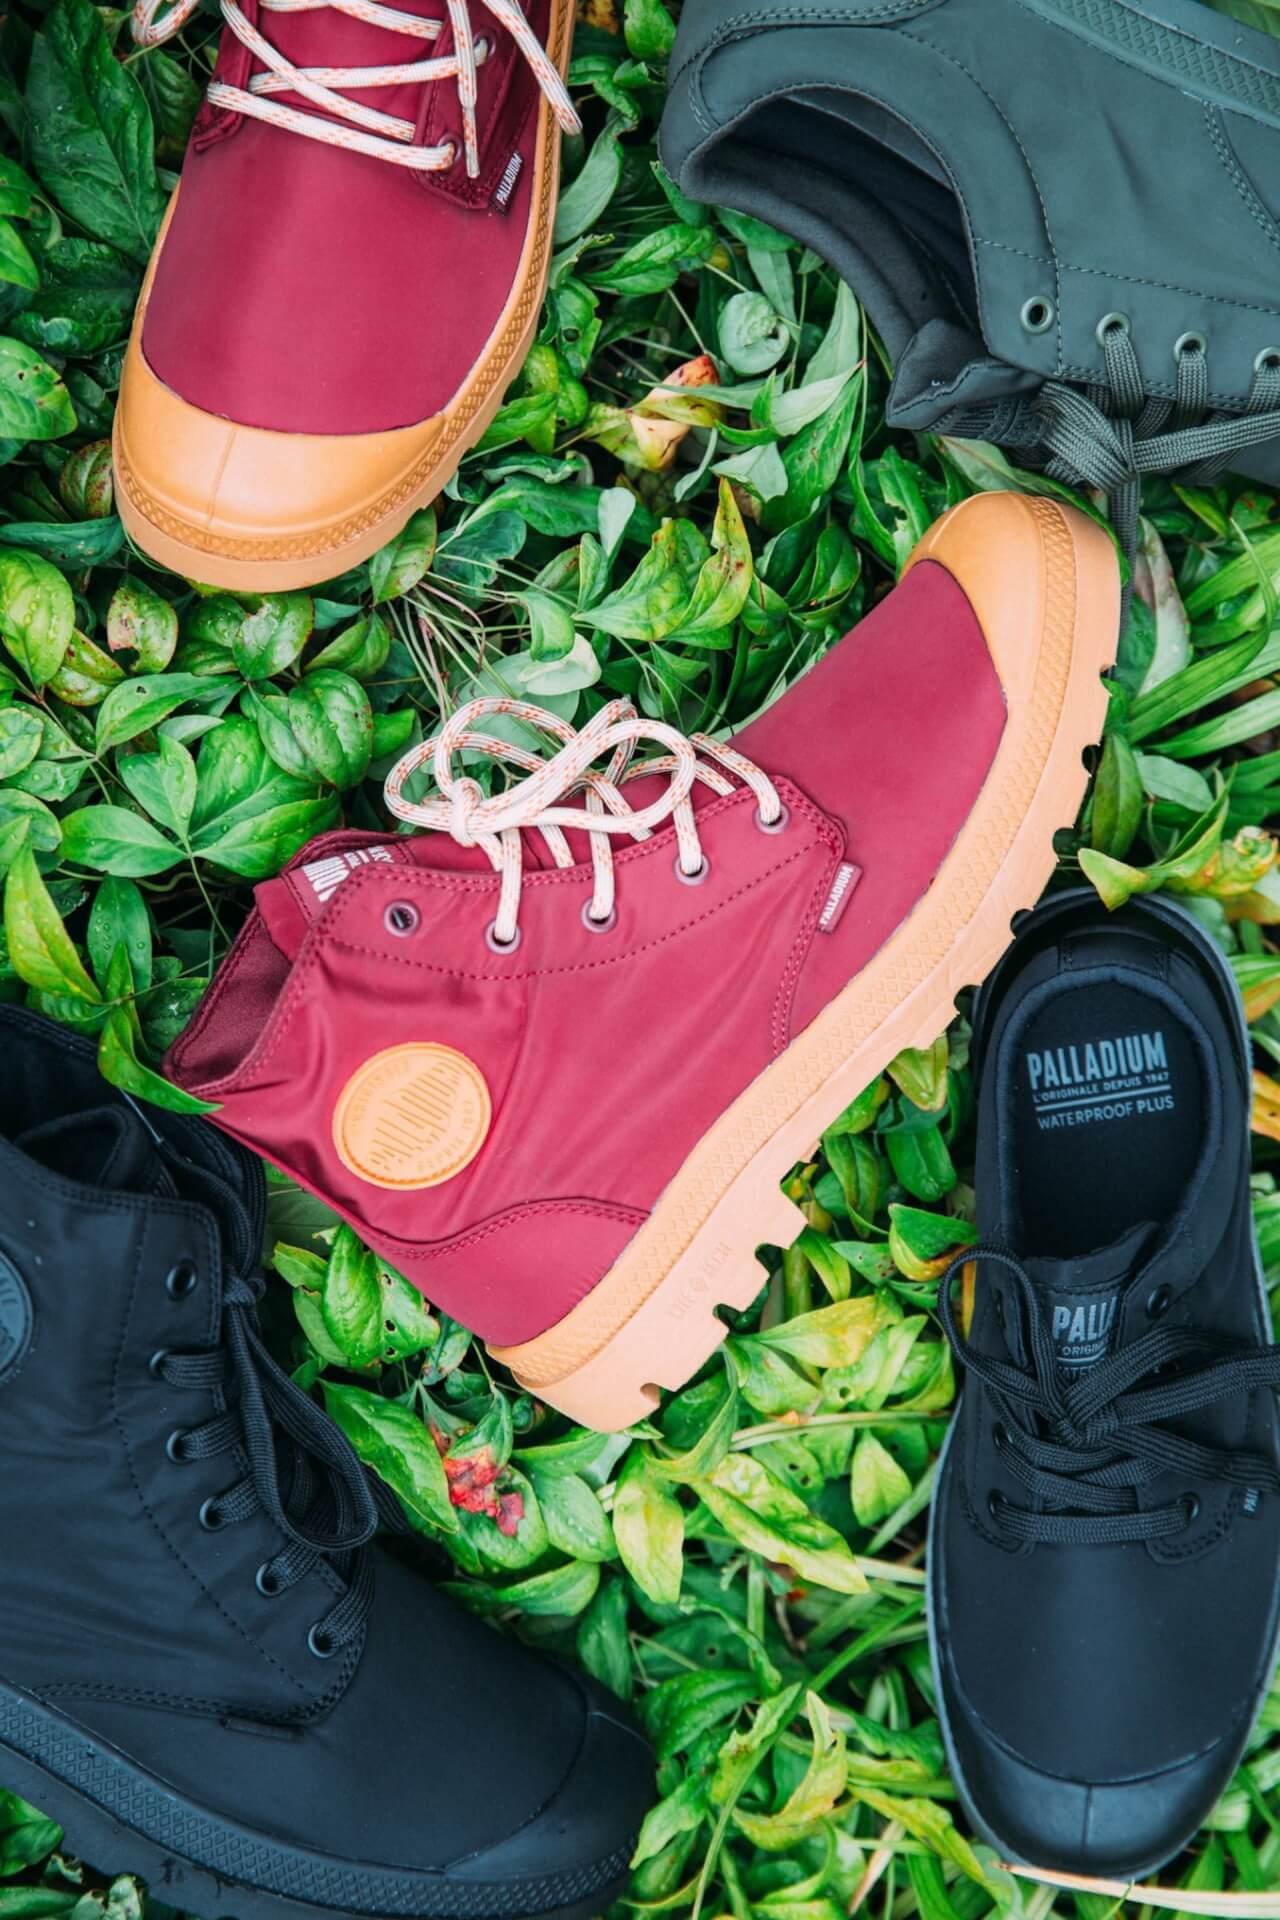 PALLADIUM徹底解剖|雨の日やアウトドア/フェスで大活躍するおしゃれな防水靴の秘密 life-fashion190704-palladium-13